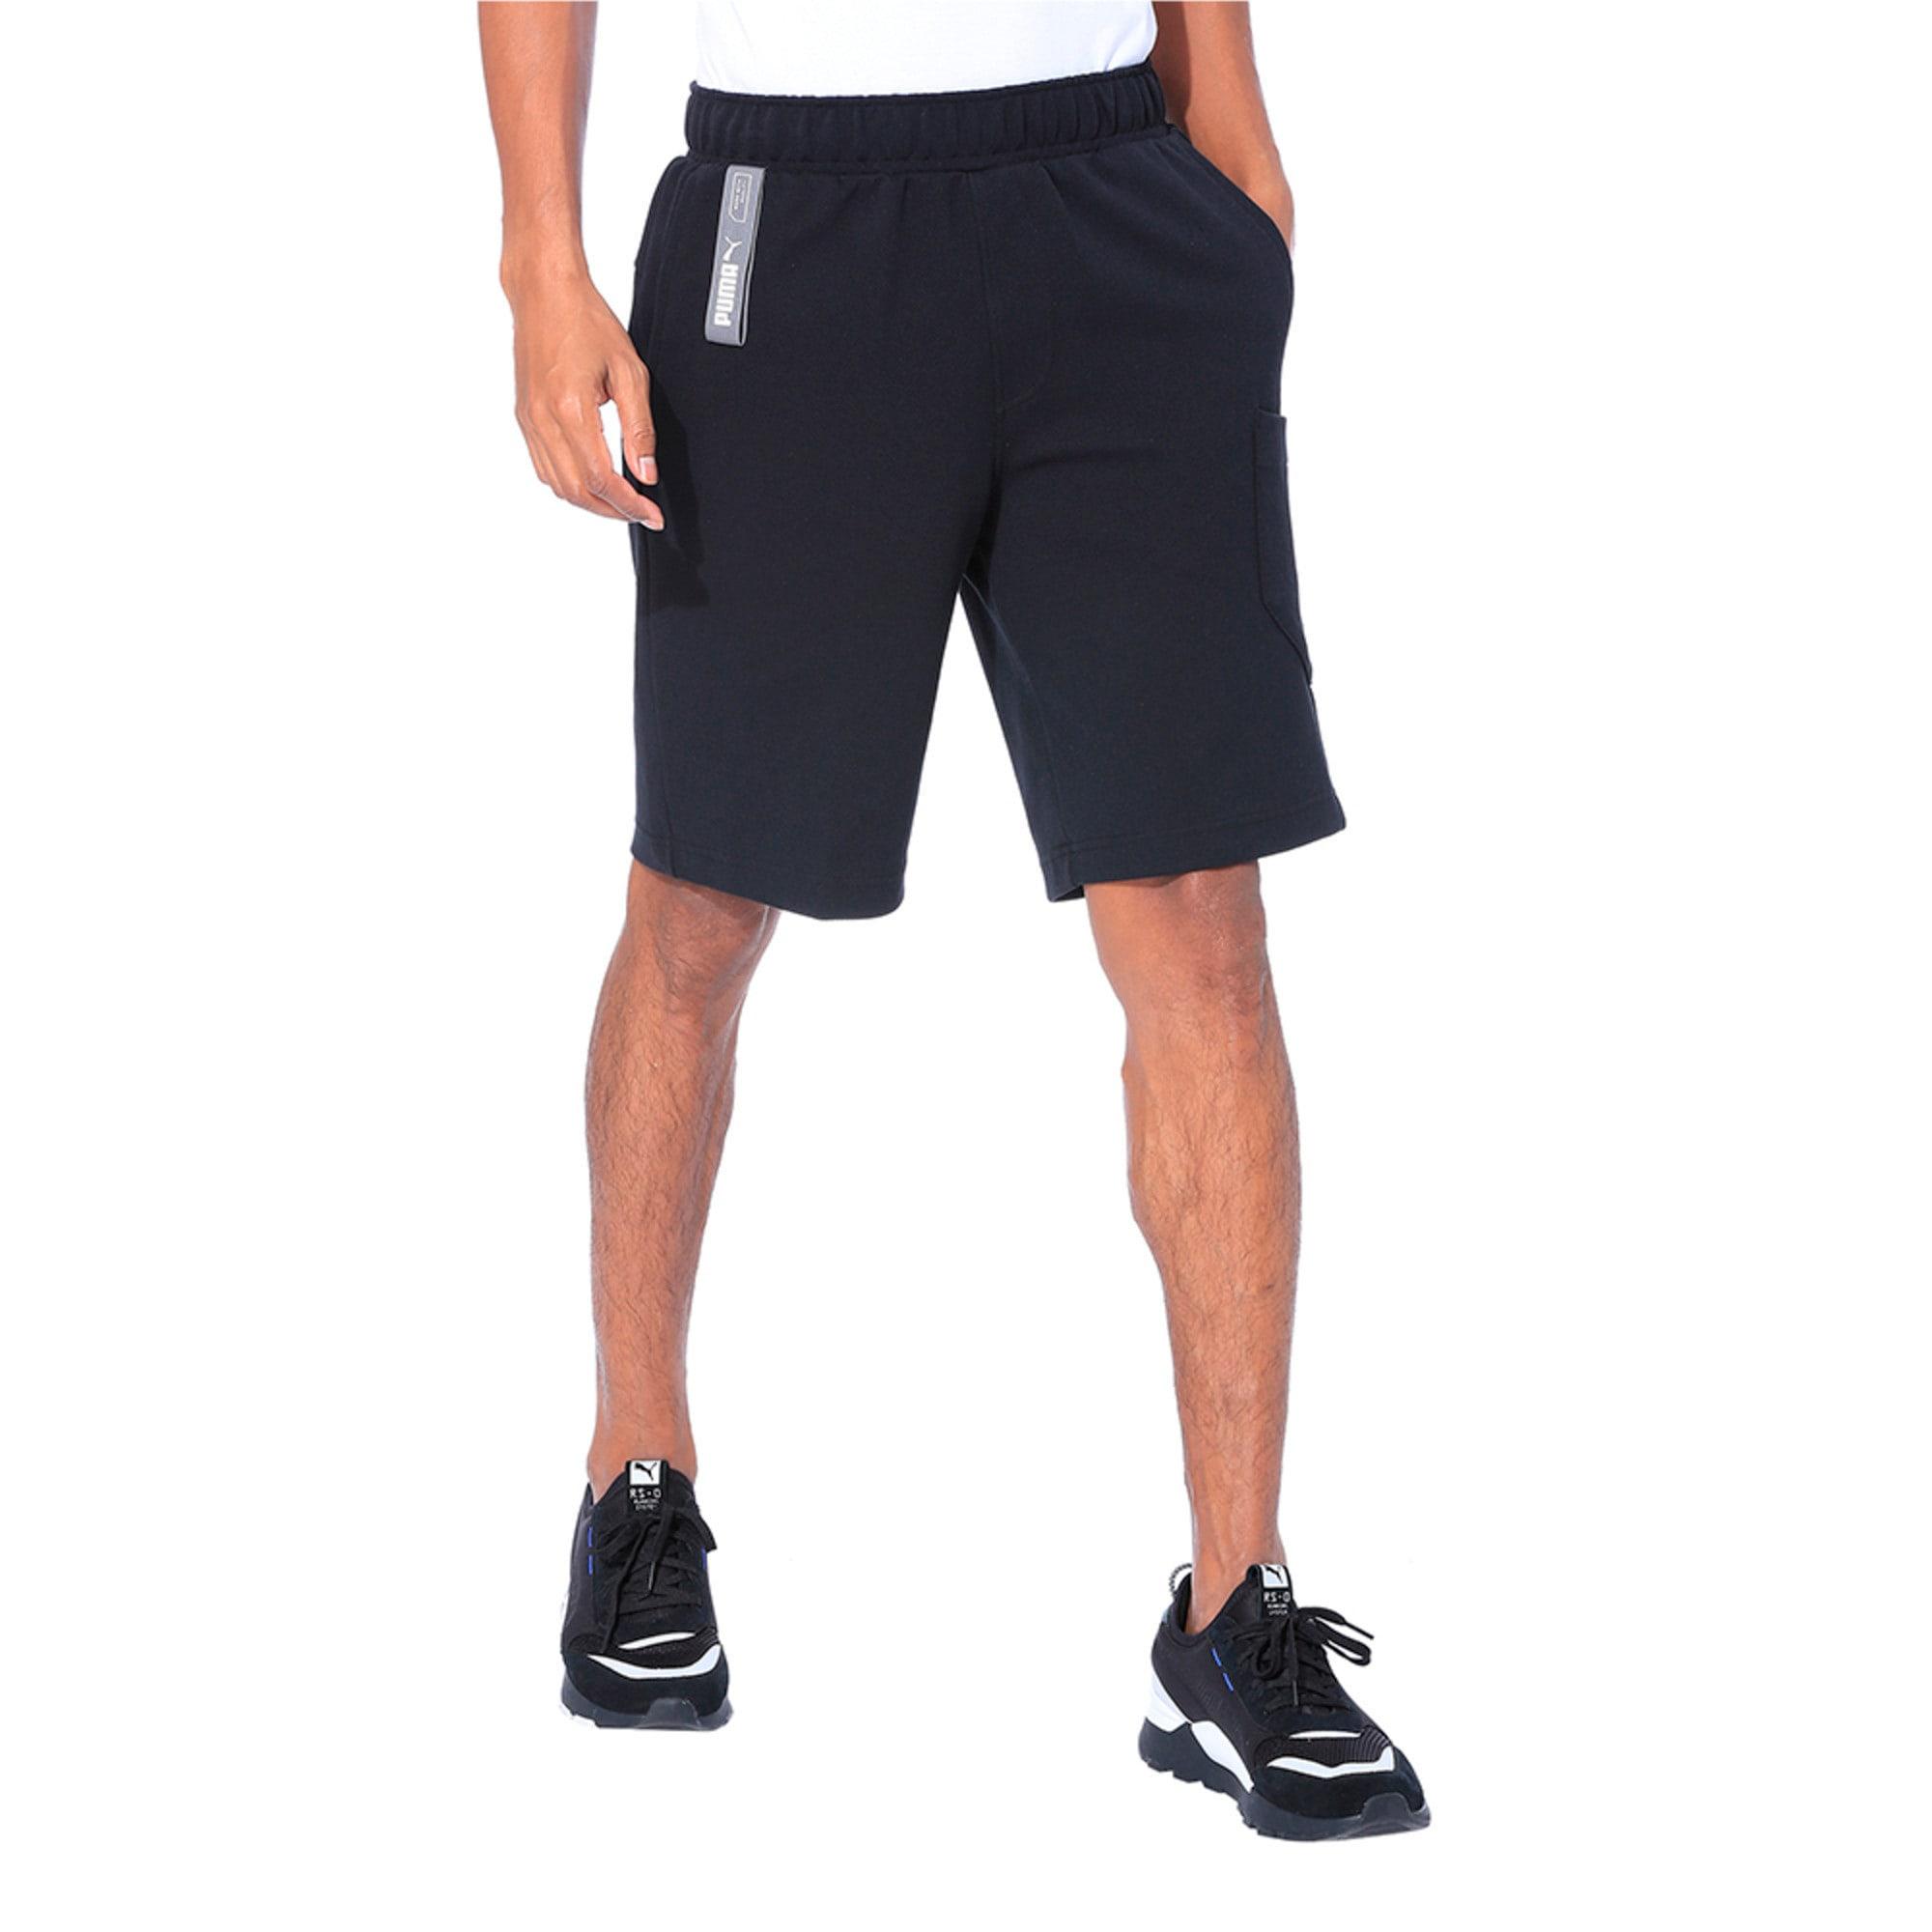 Thumbnail 1 of NU-TILITY Men's Shorts, Puma Black, medium-IND